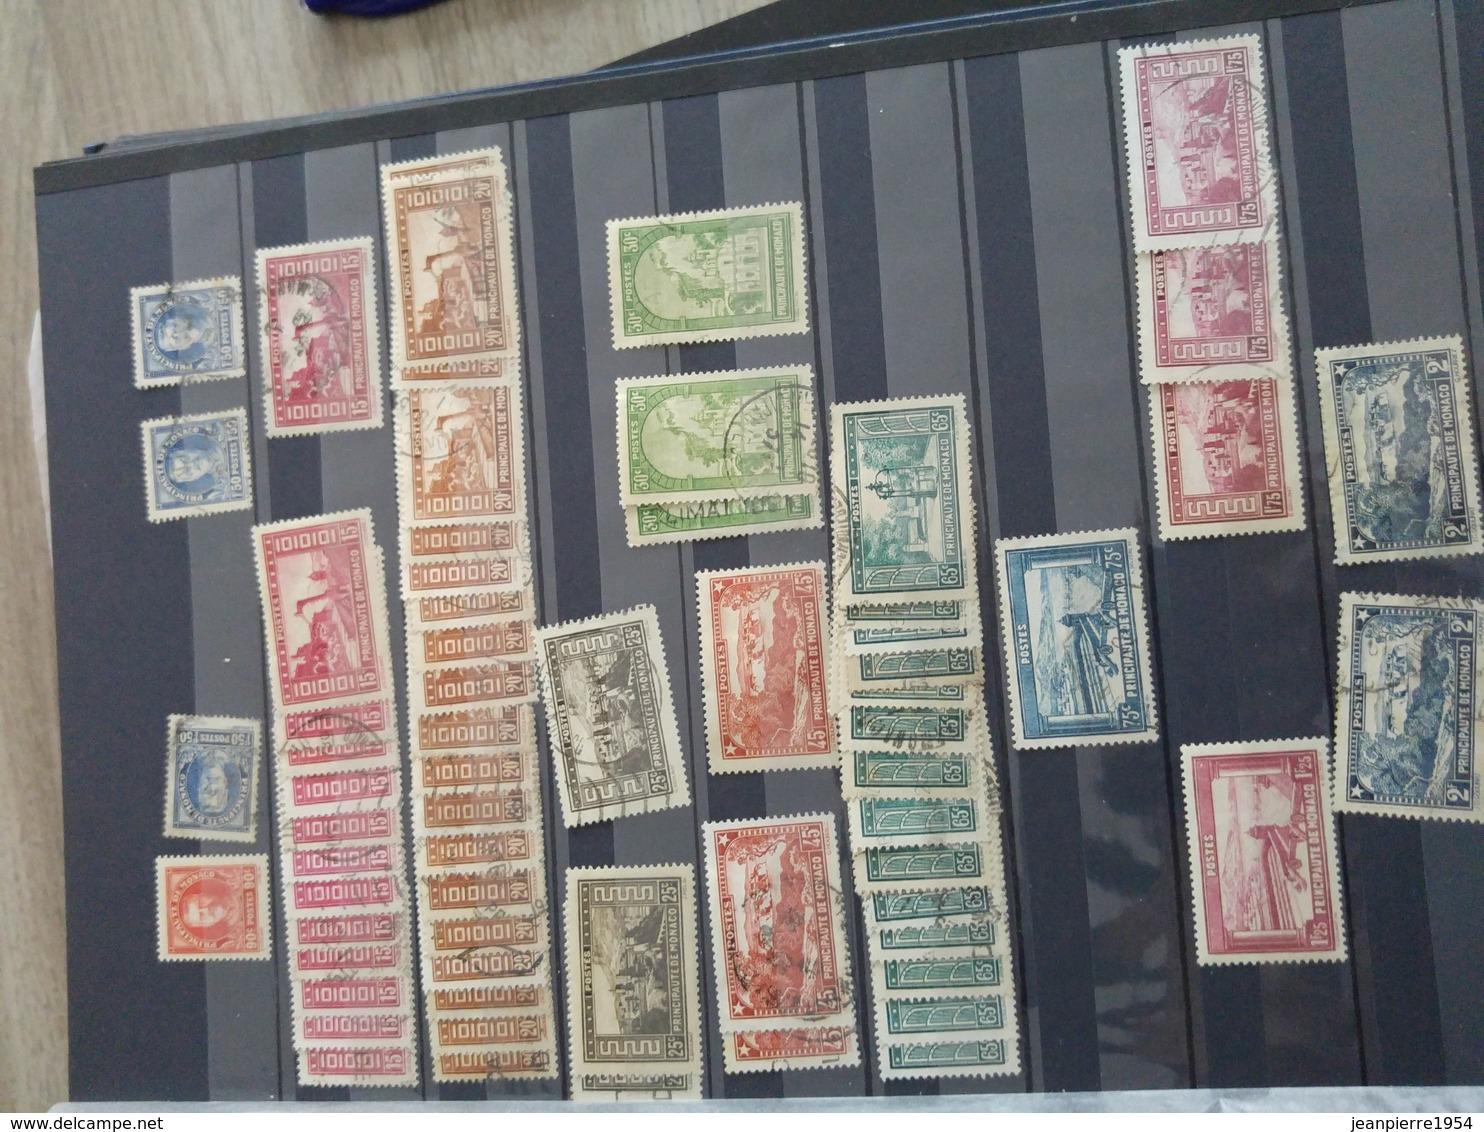 Timbres Monaco Neufxxx Et Oblitere Grosse Cote - Stamps